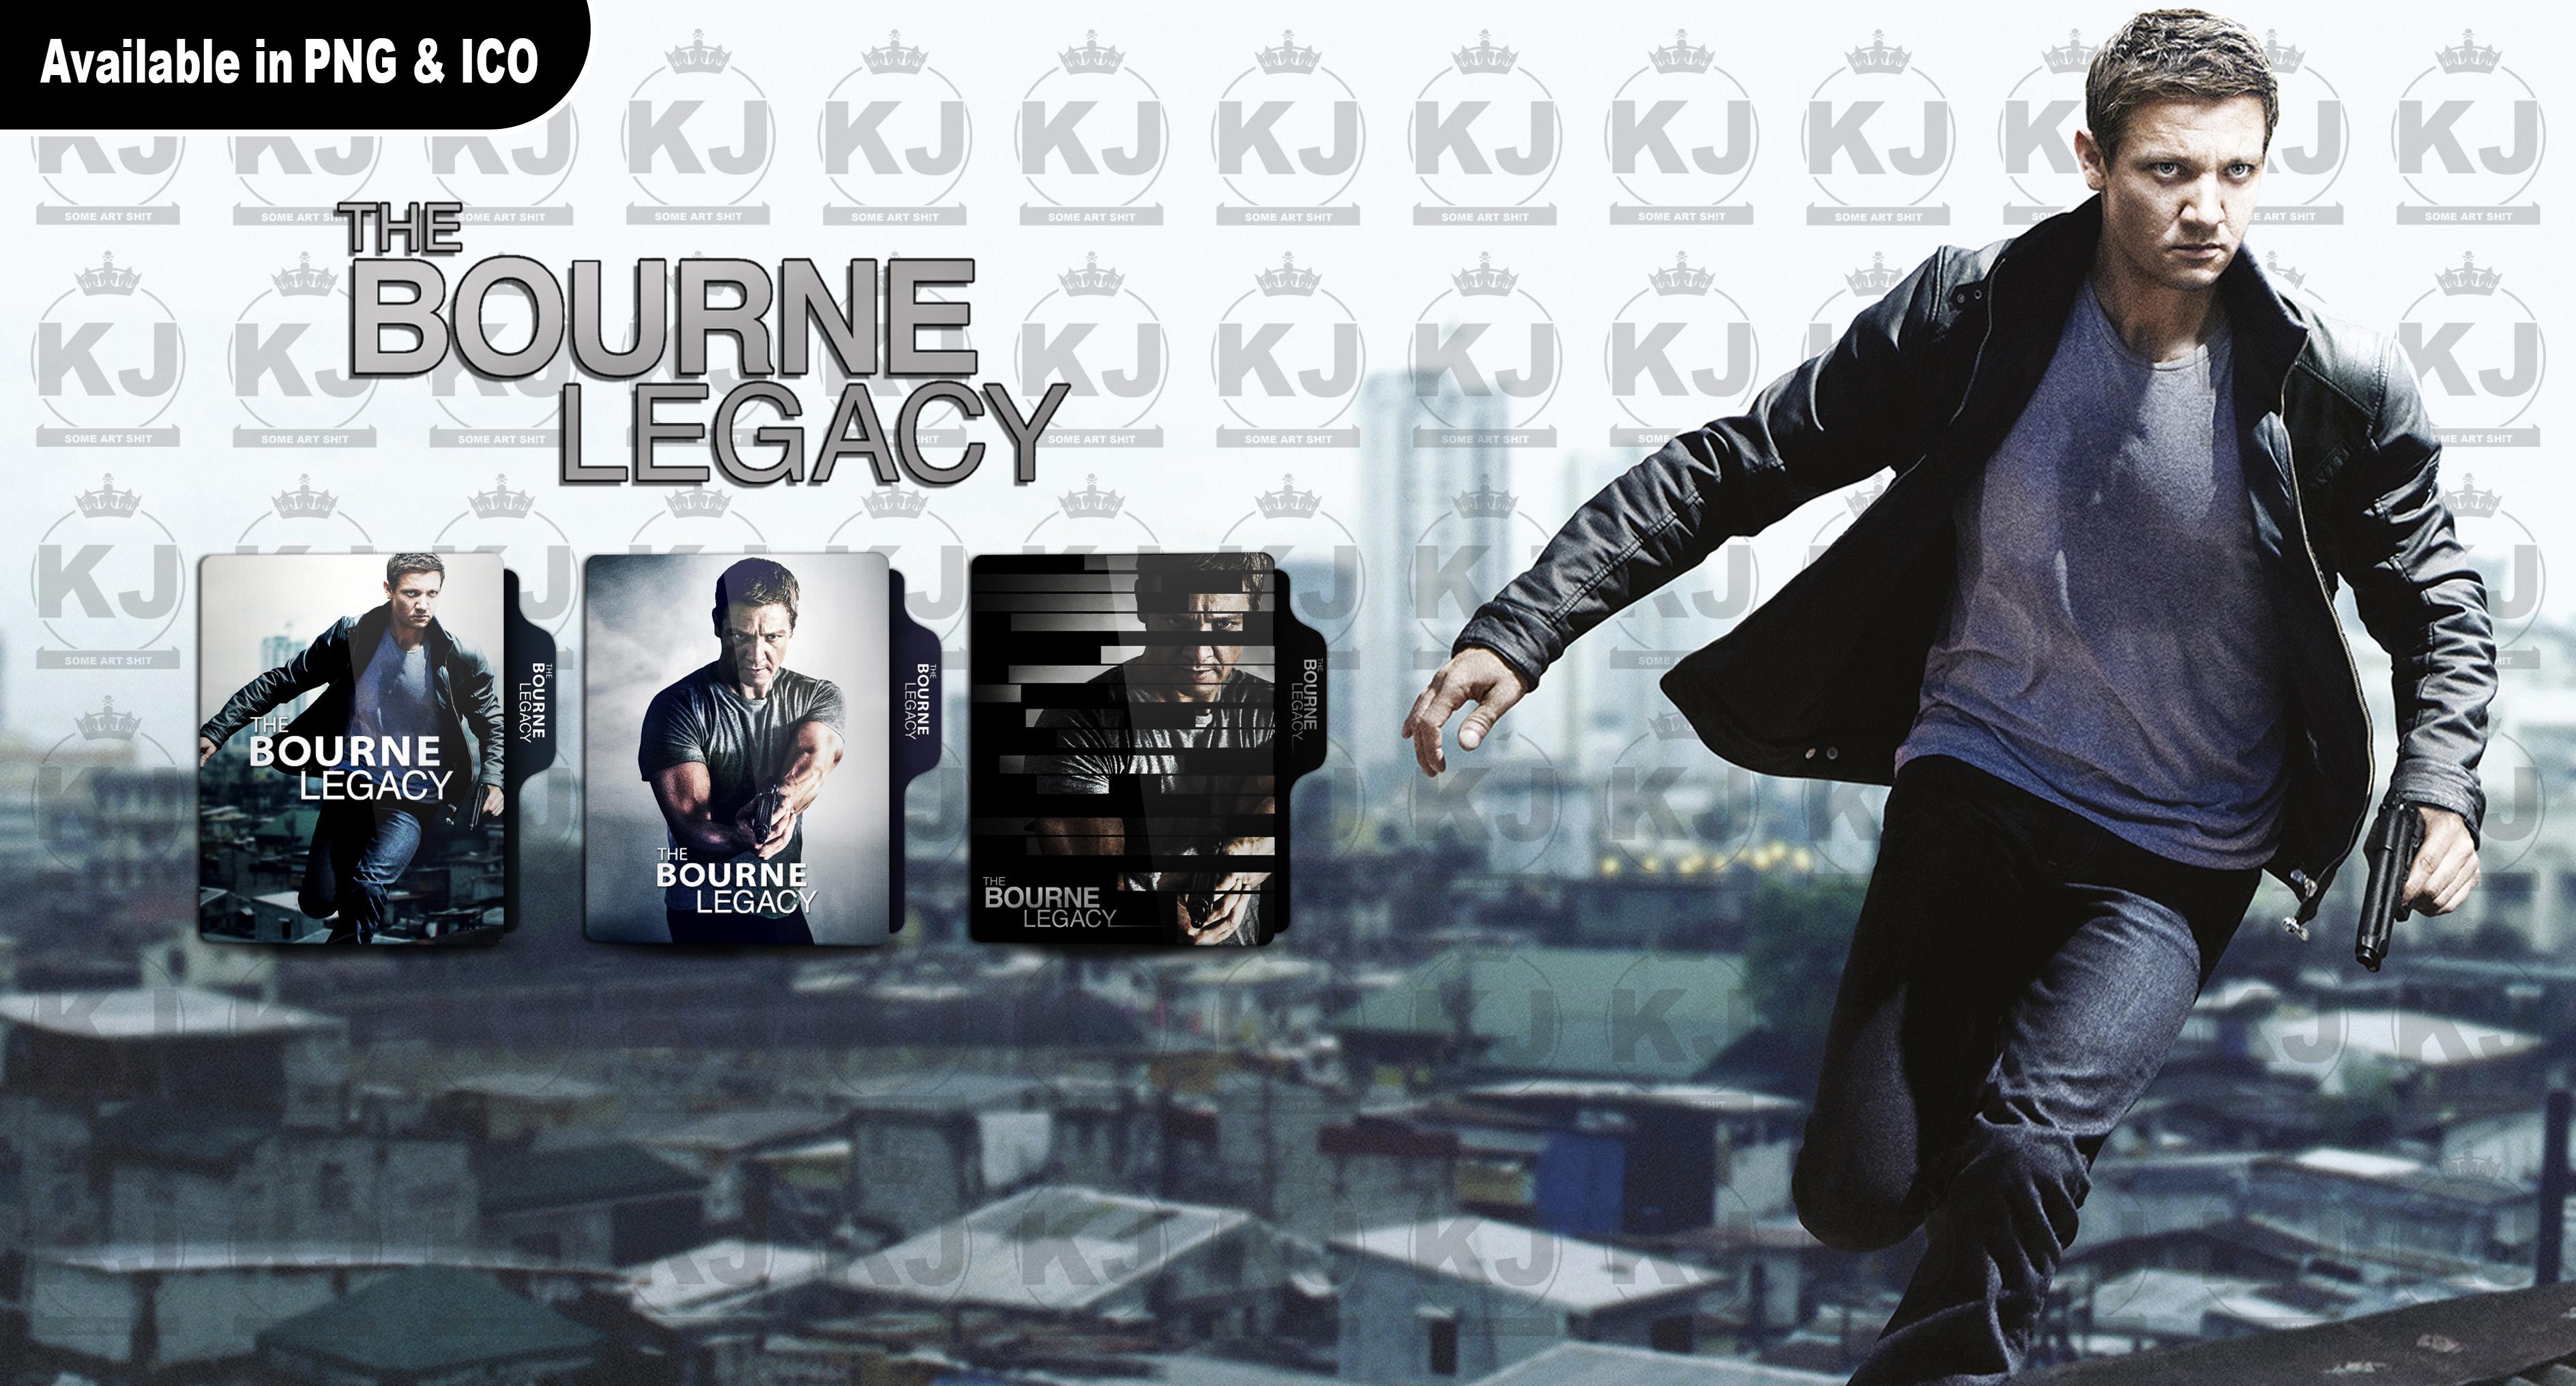 The Bourne Legacy 2012 By Kingjoe93 On Deviantart